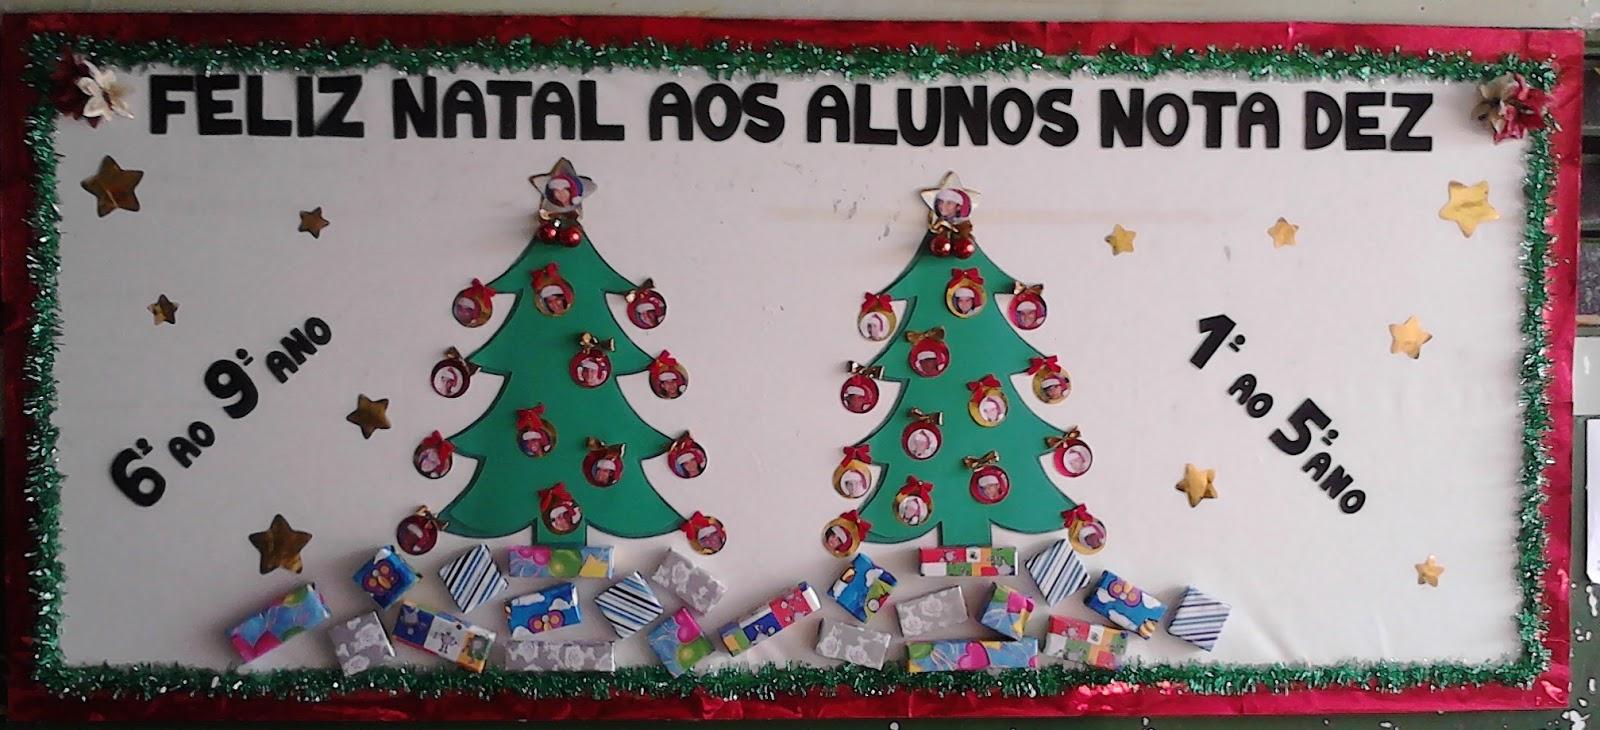 Sala de inform tica mural alunos nota dez de natal 2012 for Mural sobre o natal